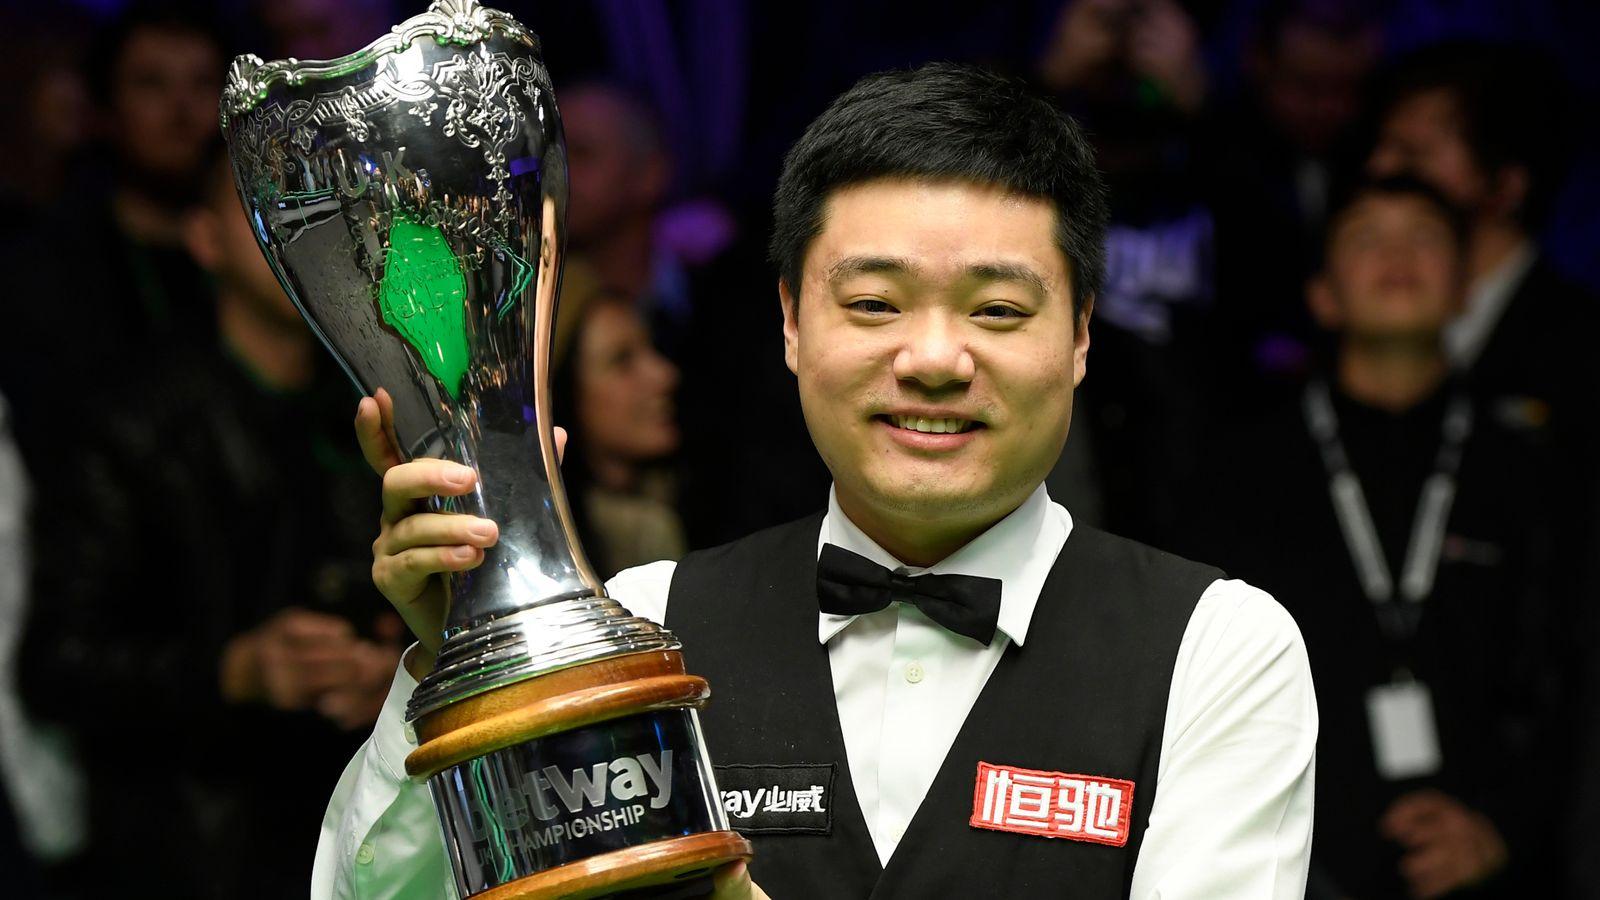 Ding Junhui defeats Stephen Maguire to win UK Snooker Championship